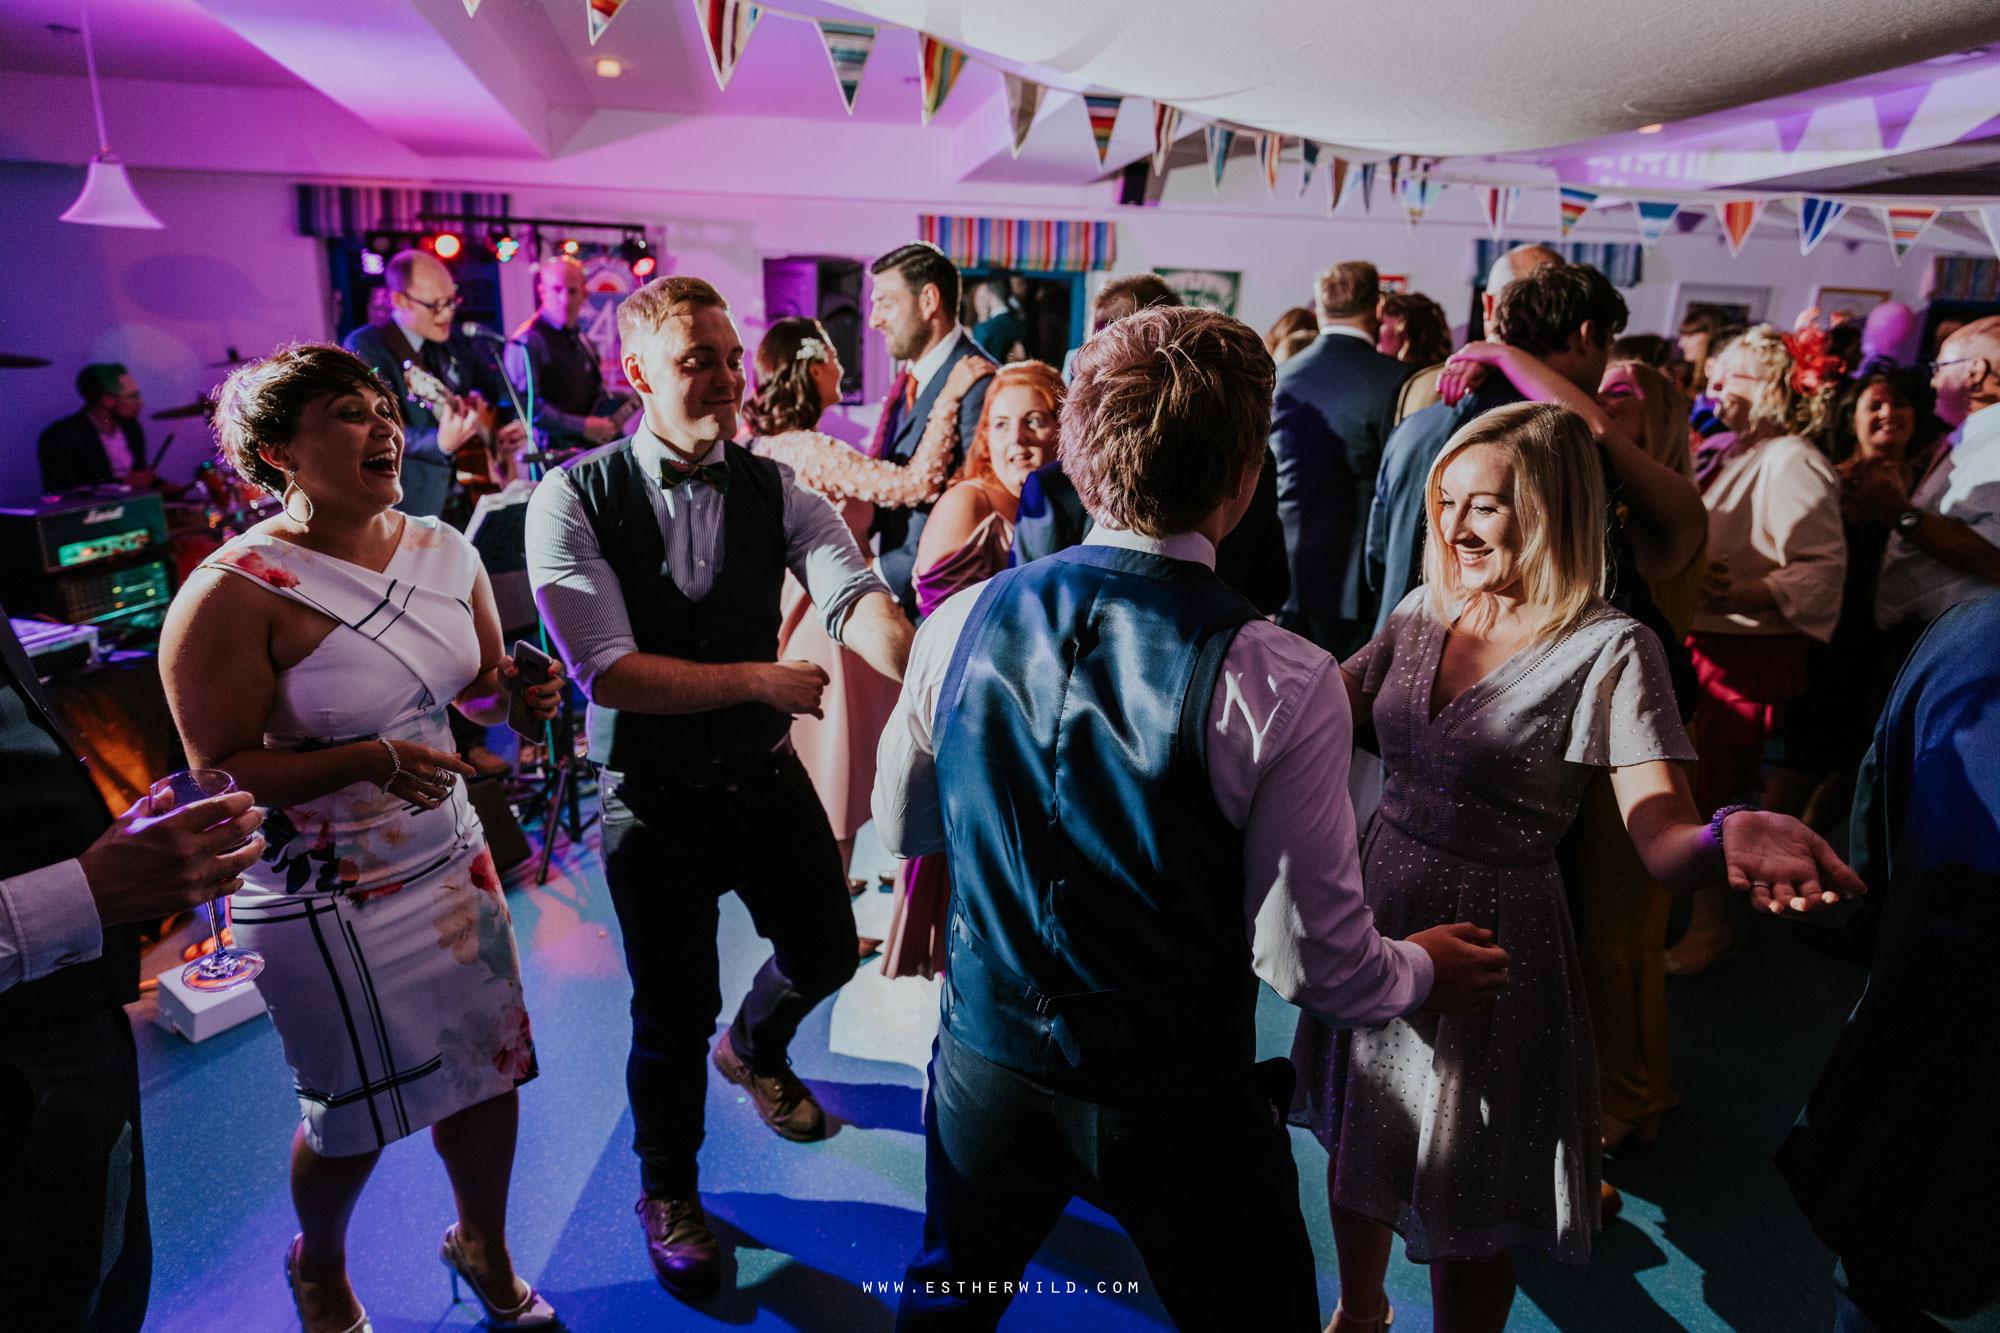 Cromer_Wedding_Beach_Outdoor_Ceremony_Norfolk_North_Lodge_Registry_Office_Rocket_House_Cafe_Cromer_Pier_IMG_5547.jpg